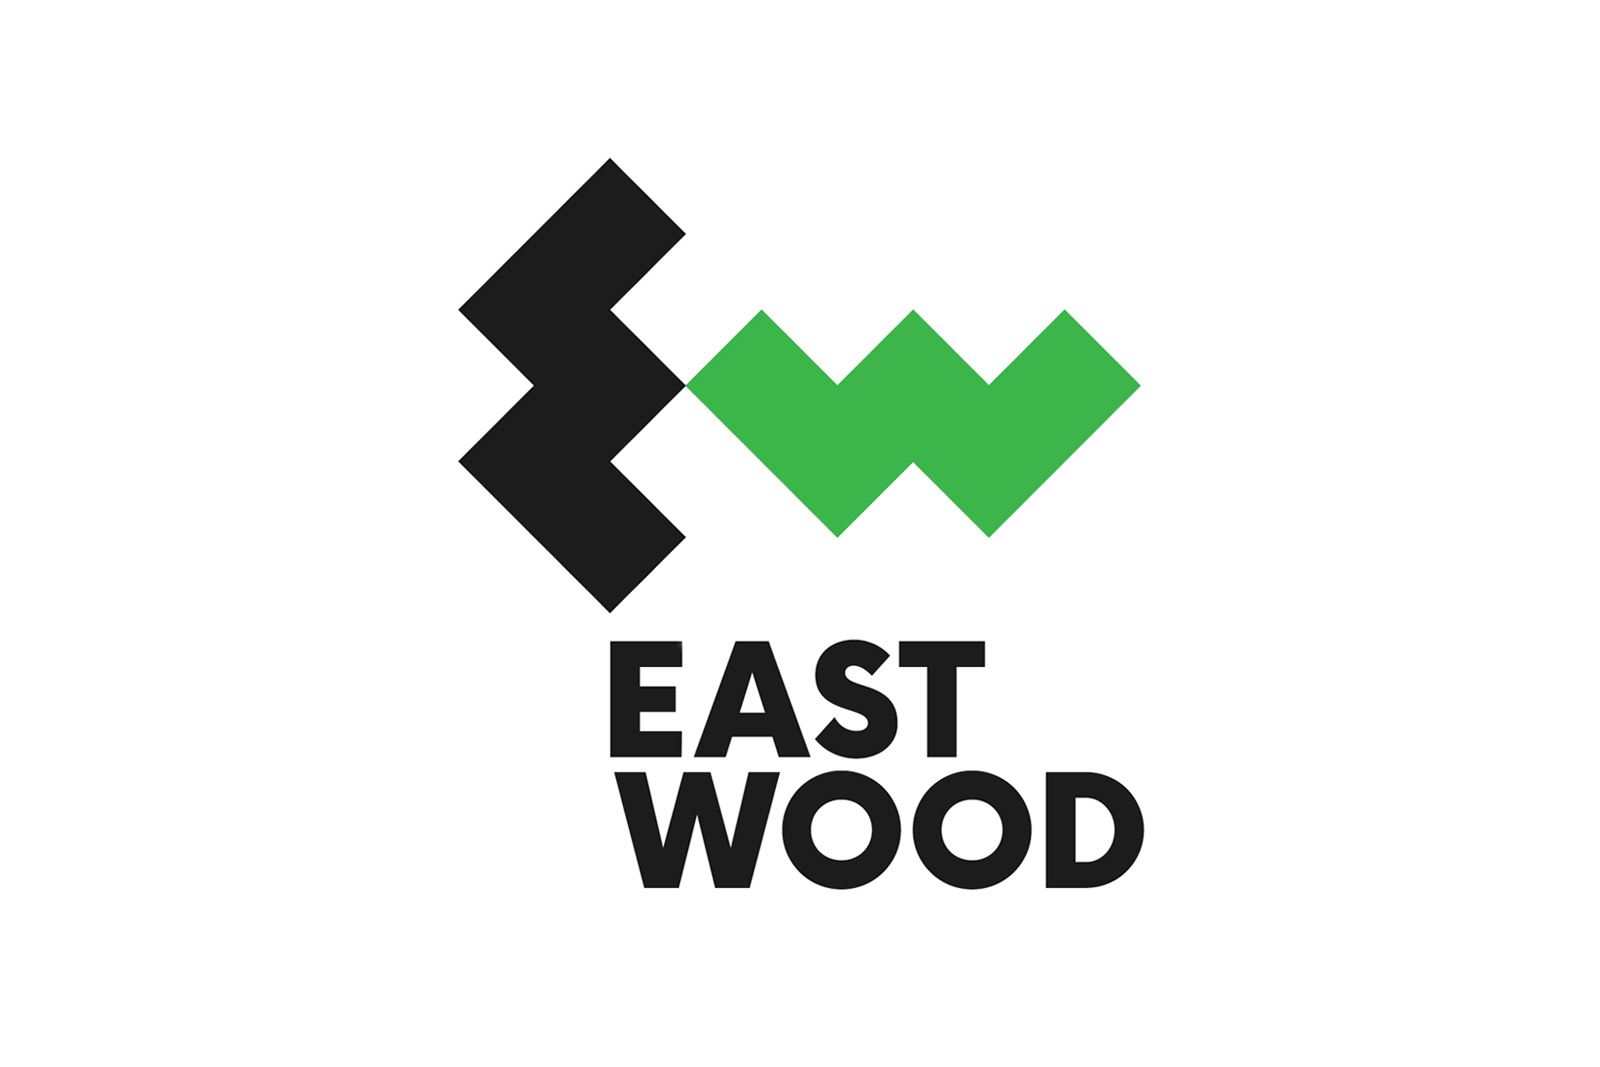 Asgard Branding, фирменный стиль, айдентика, лого, Eastwood